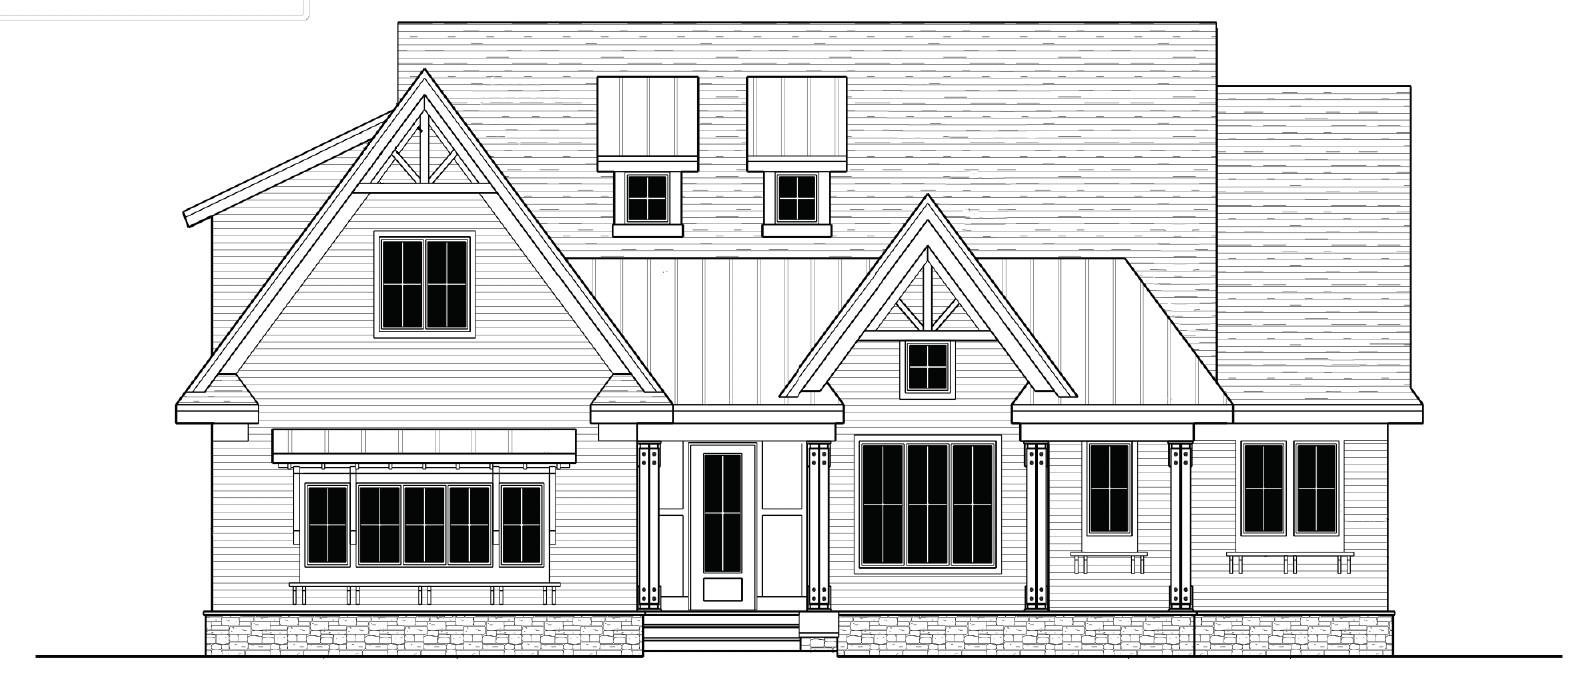 310 Wendling Blvd Property Photo - Gallatin, TN real estate listing